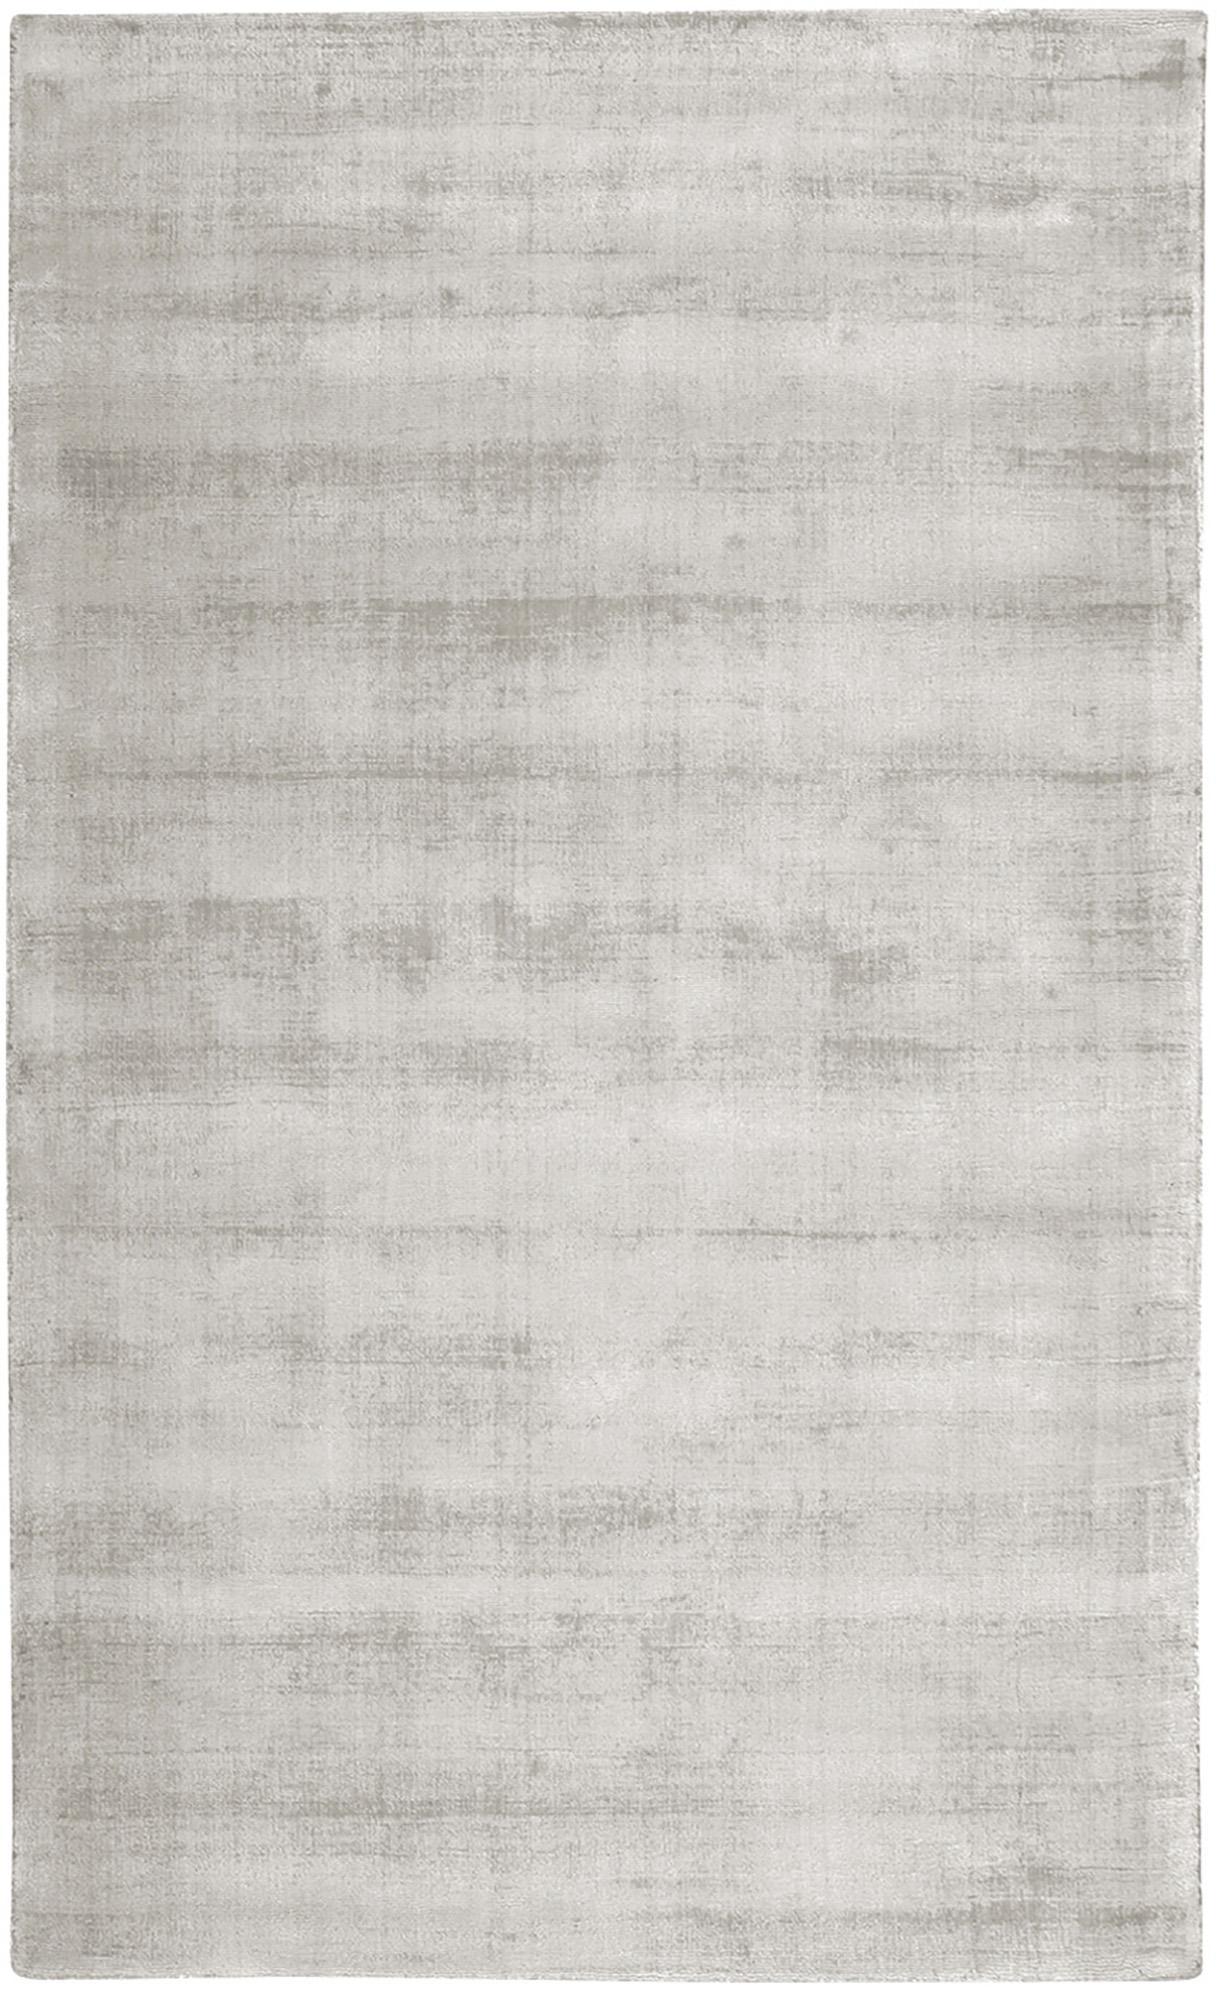 Handgewebter Viskoseteppich Jane in Hellgrau-Beige, Flor: 100% Viskose, Hellgrau-Beige, B 90 x L 150 cm (Größe XS)